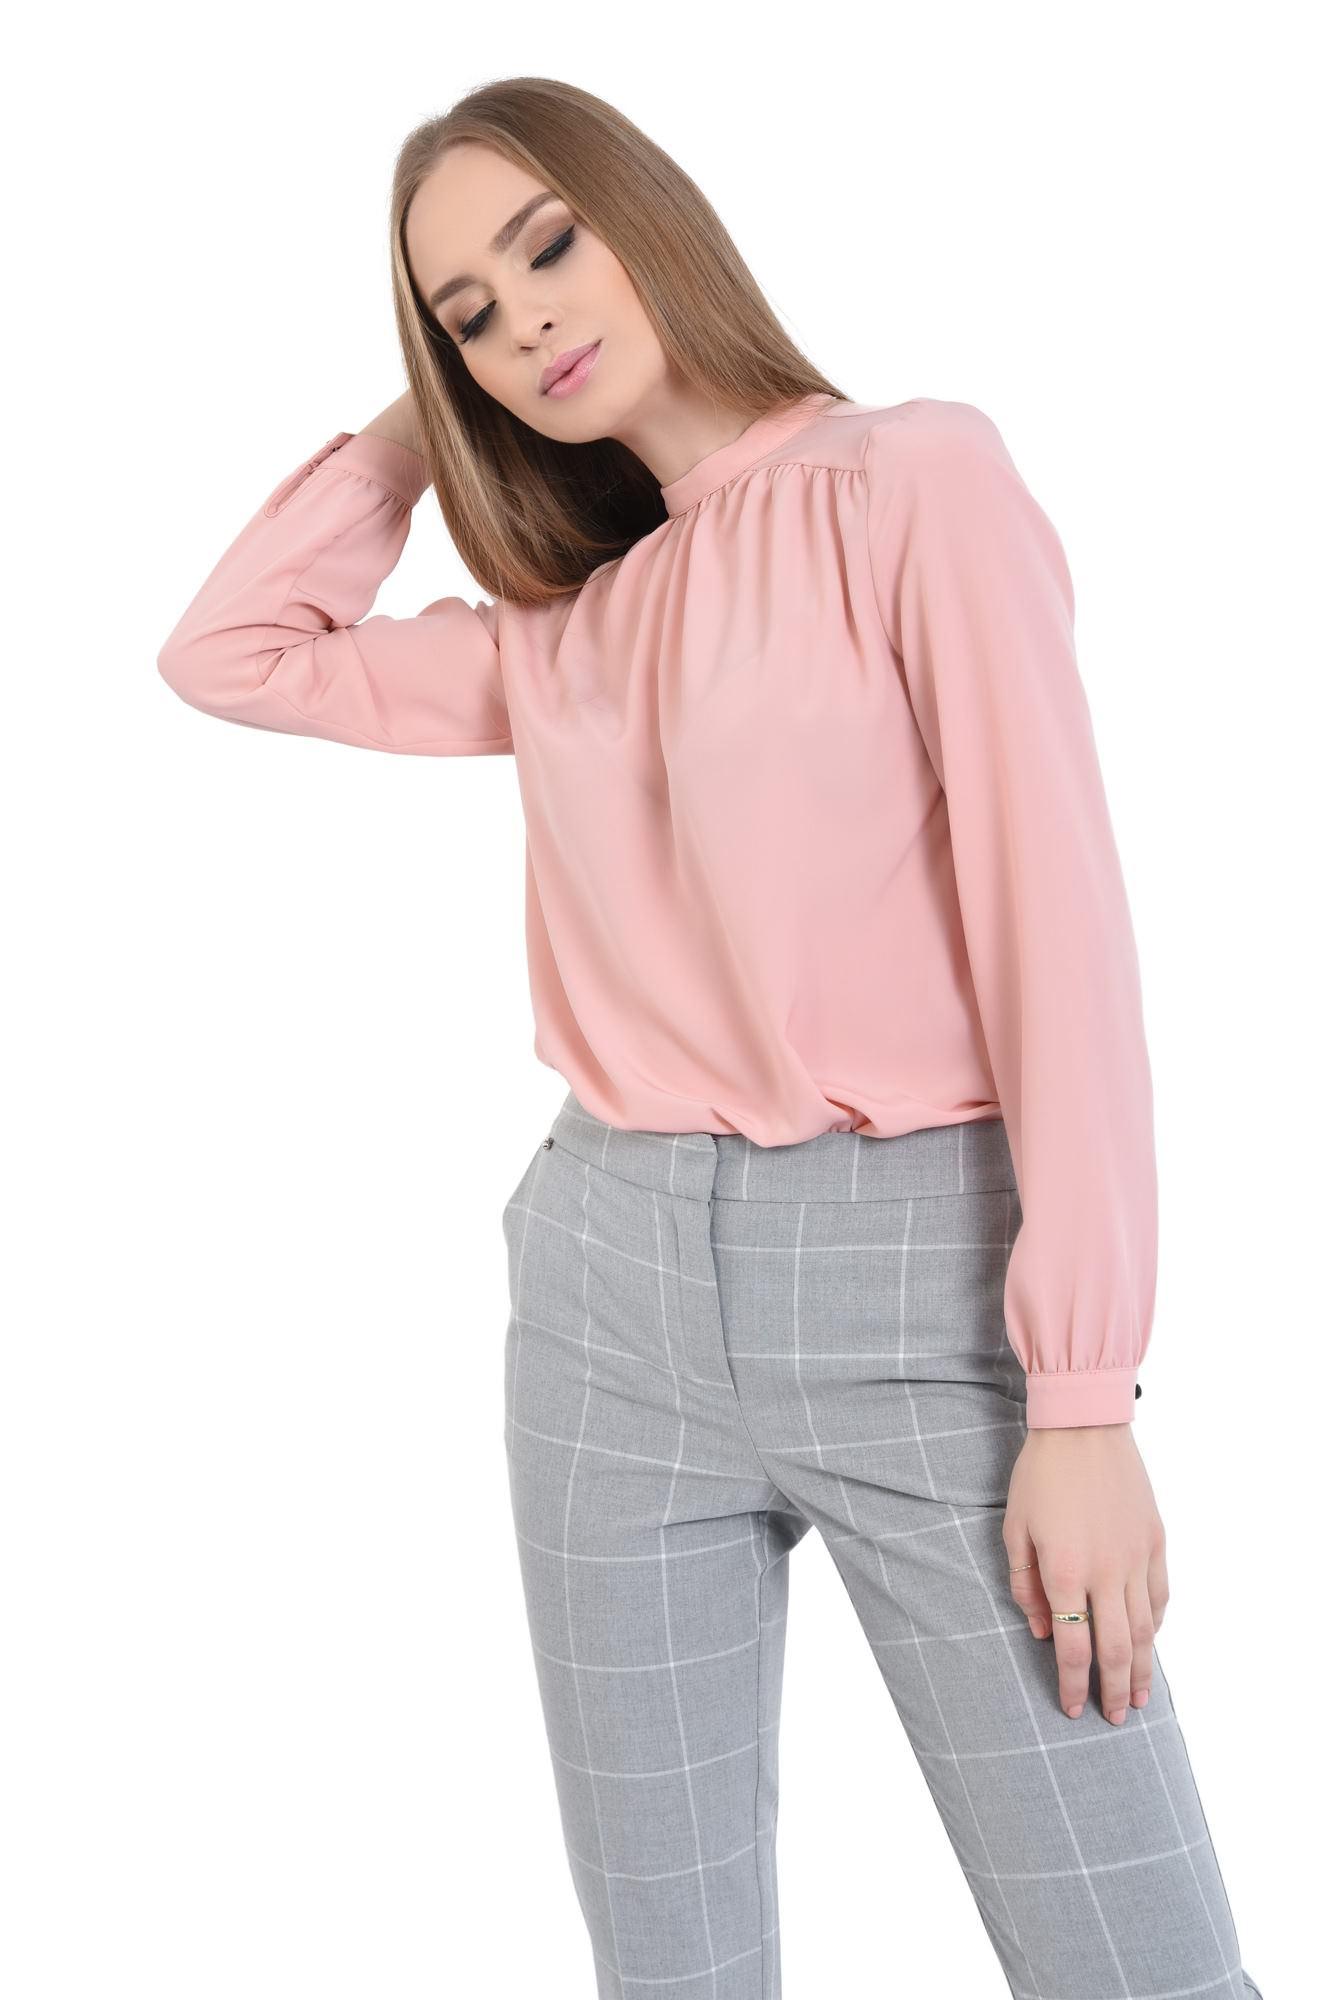 2 - bluza roz, maneci bufante, cu mansete